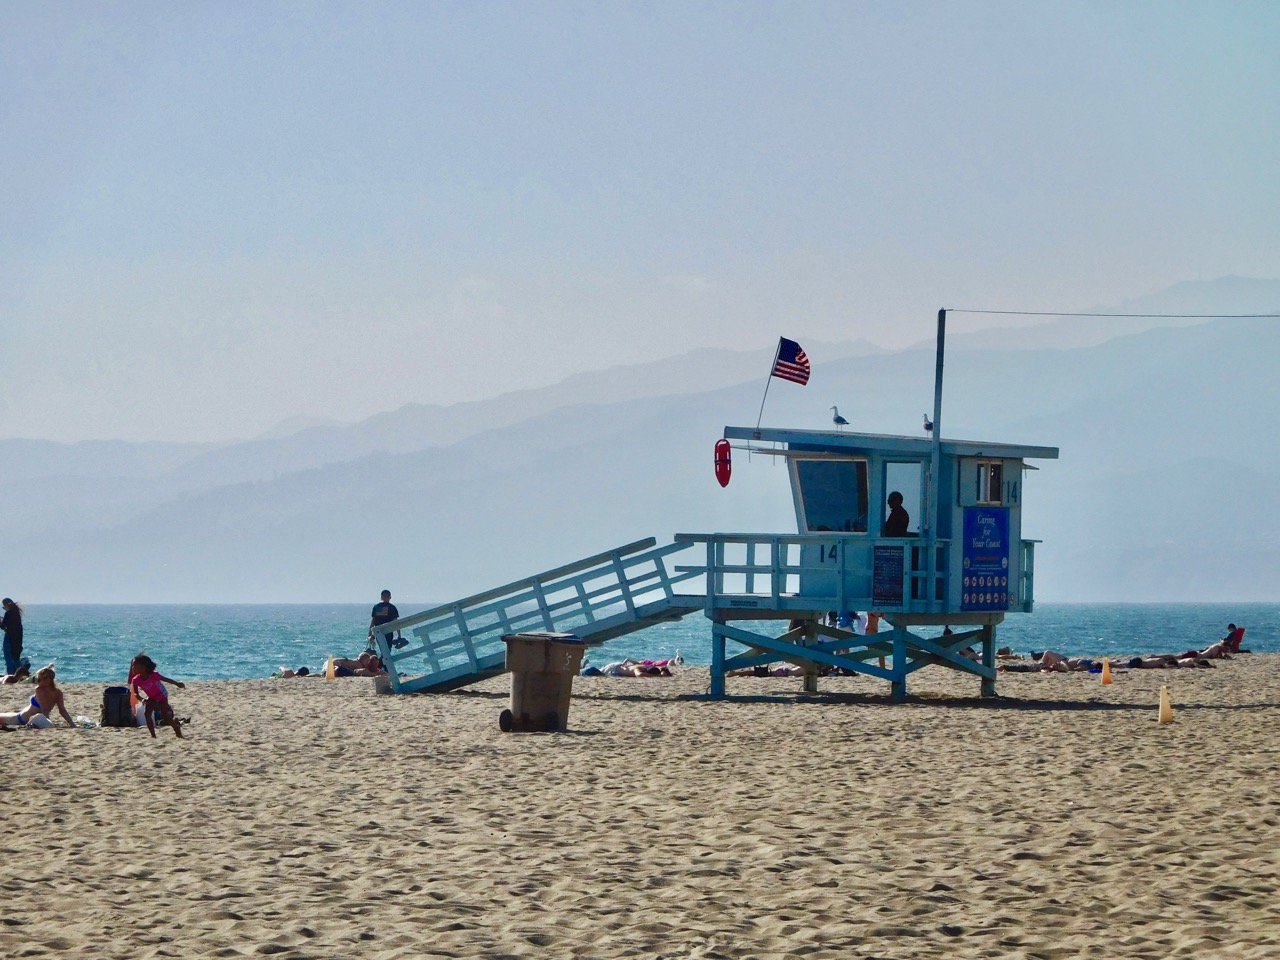 3 Days in L.A. - Santa Monica Beach (5)